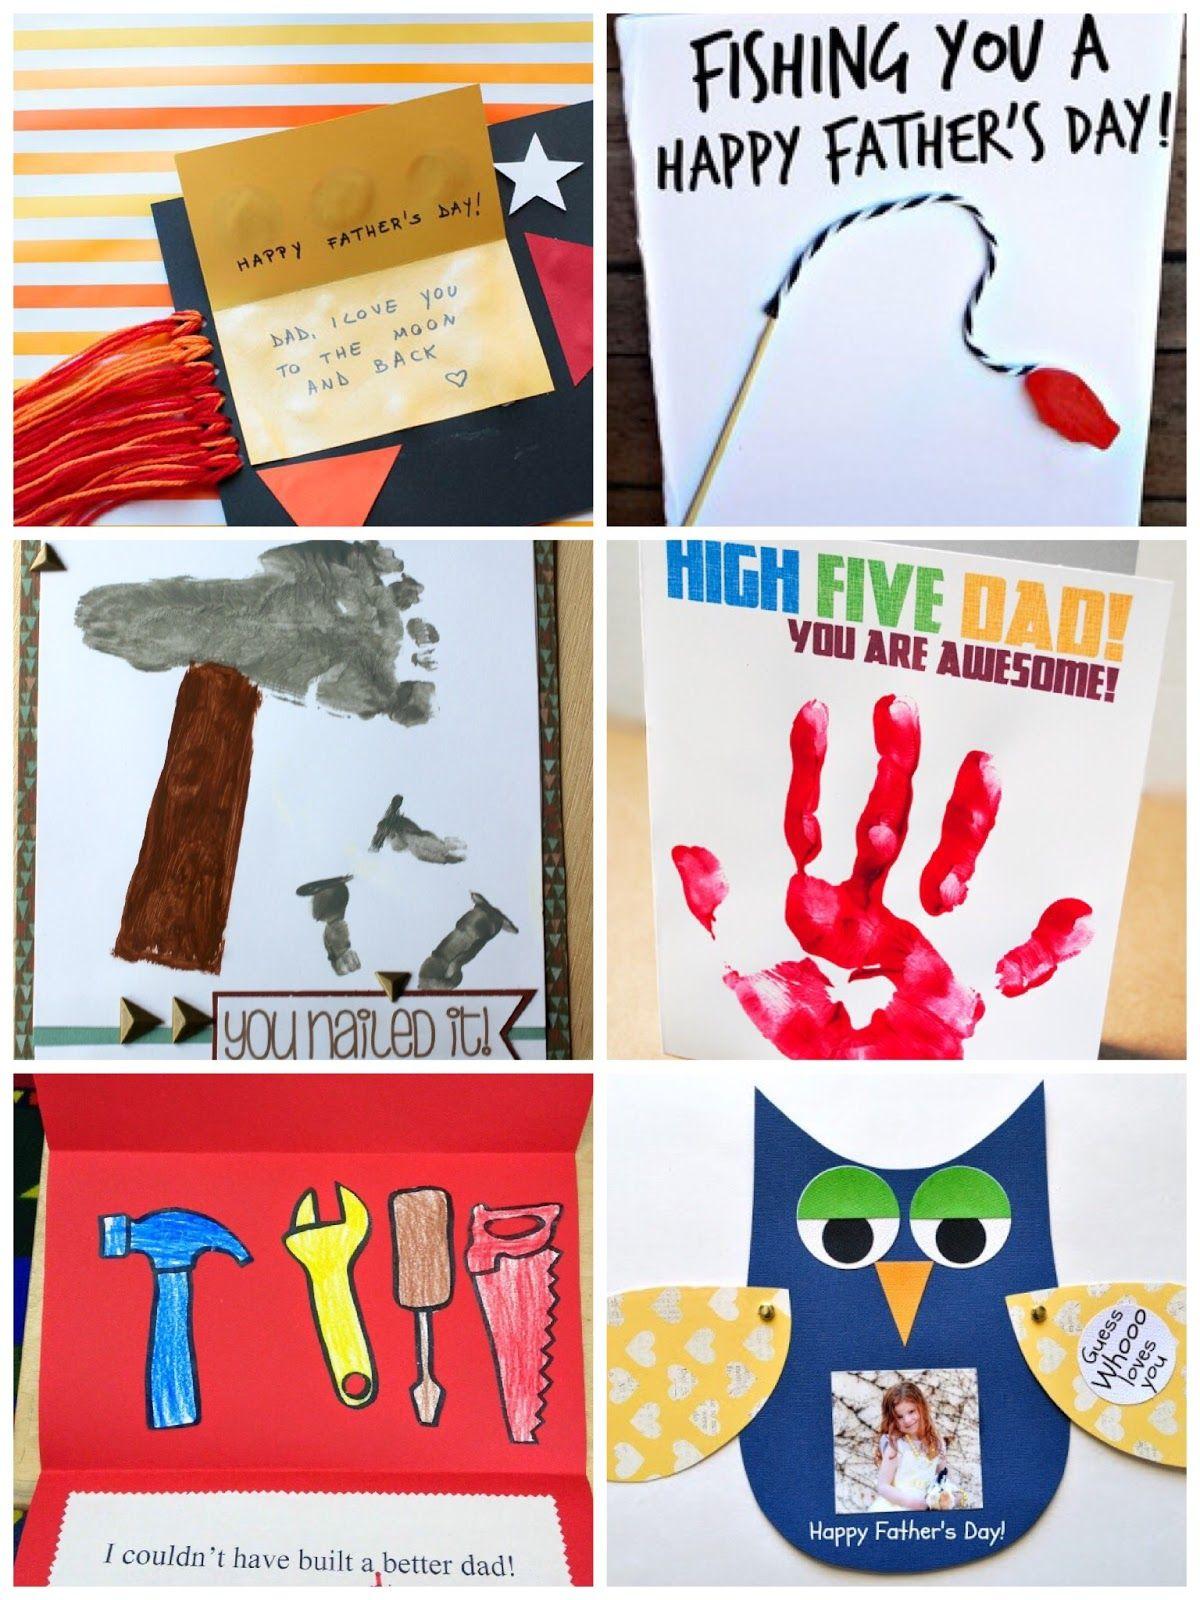 Pin By Chrisoula Budgell On Craft Ideas - Pinterest -